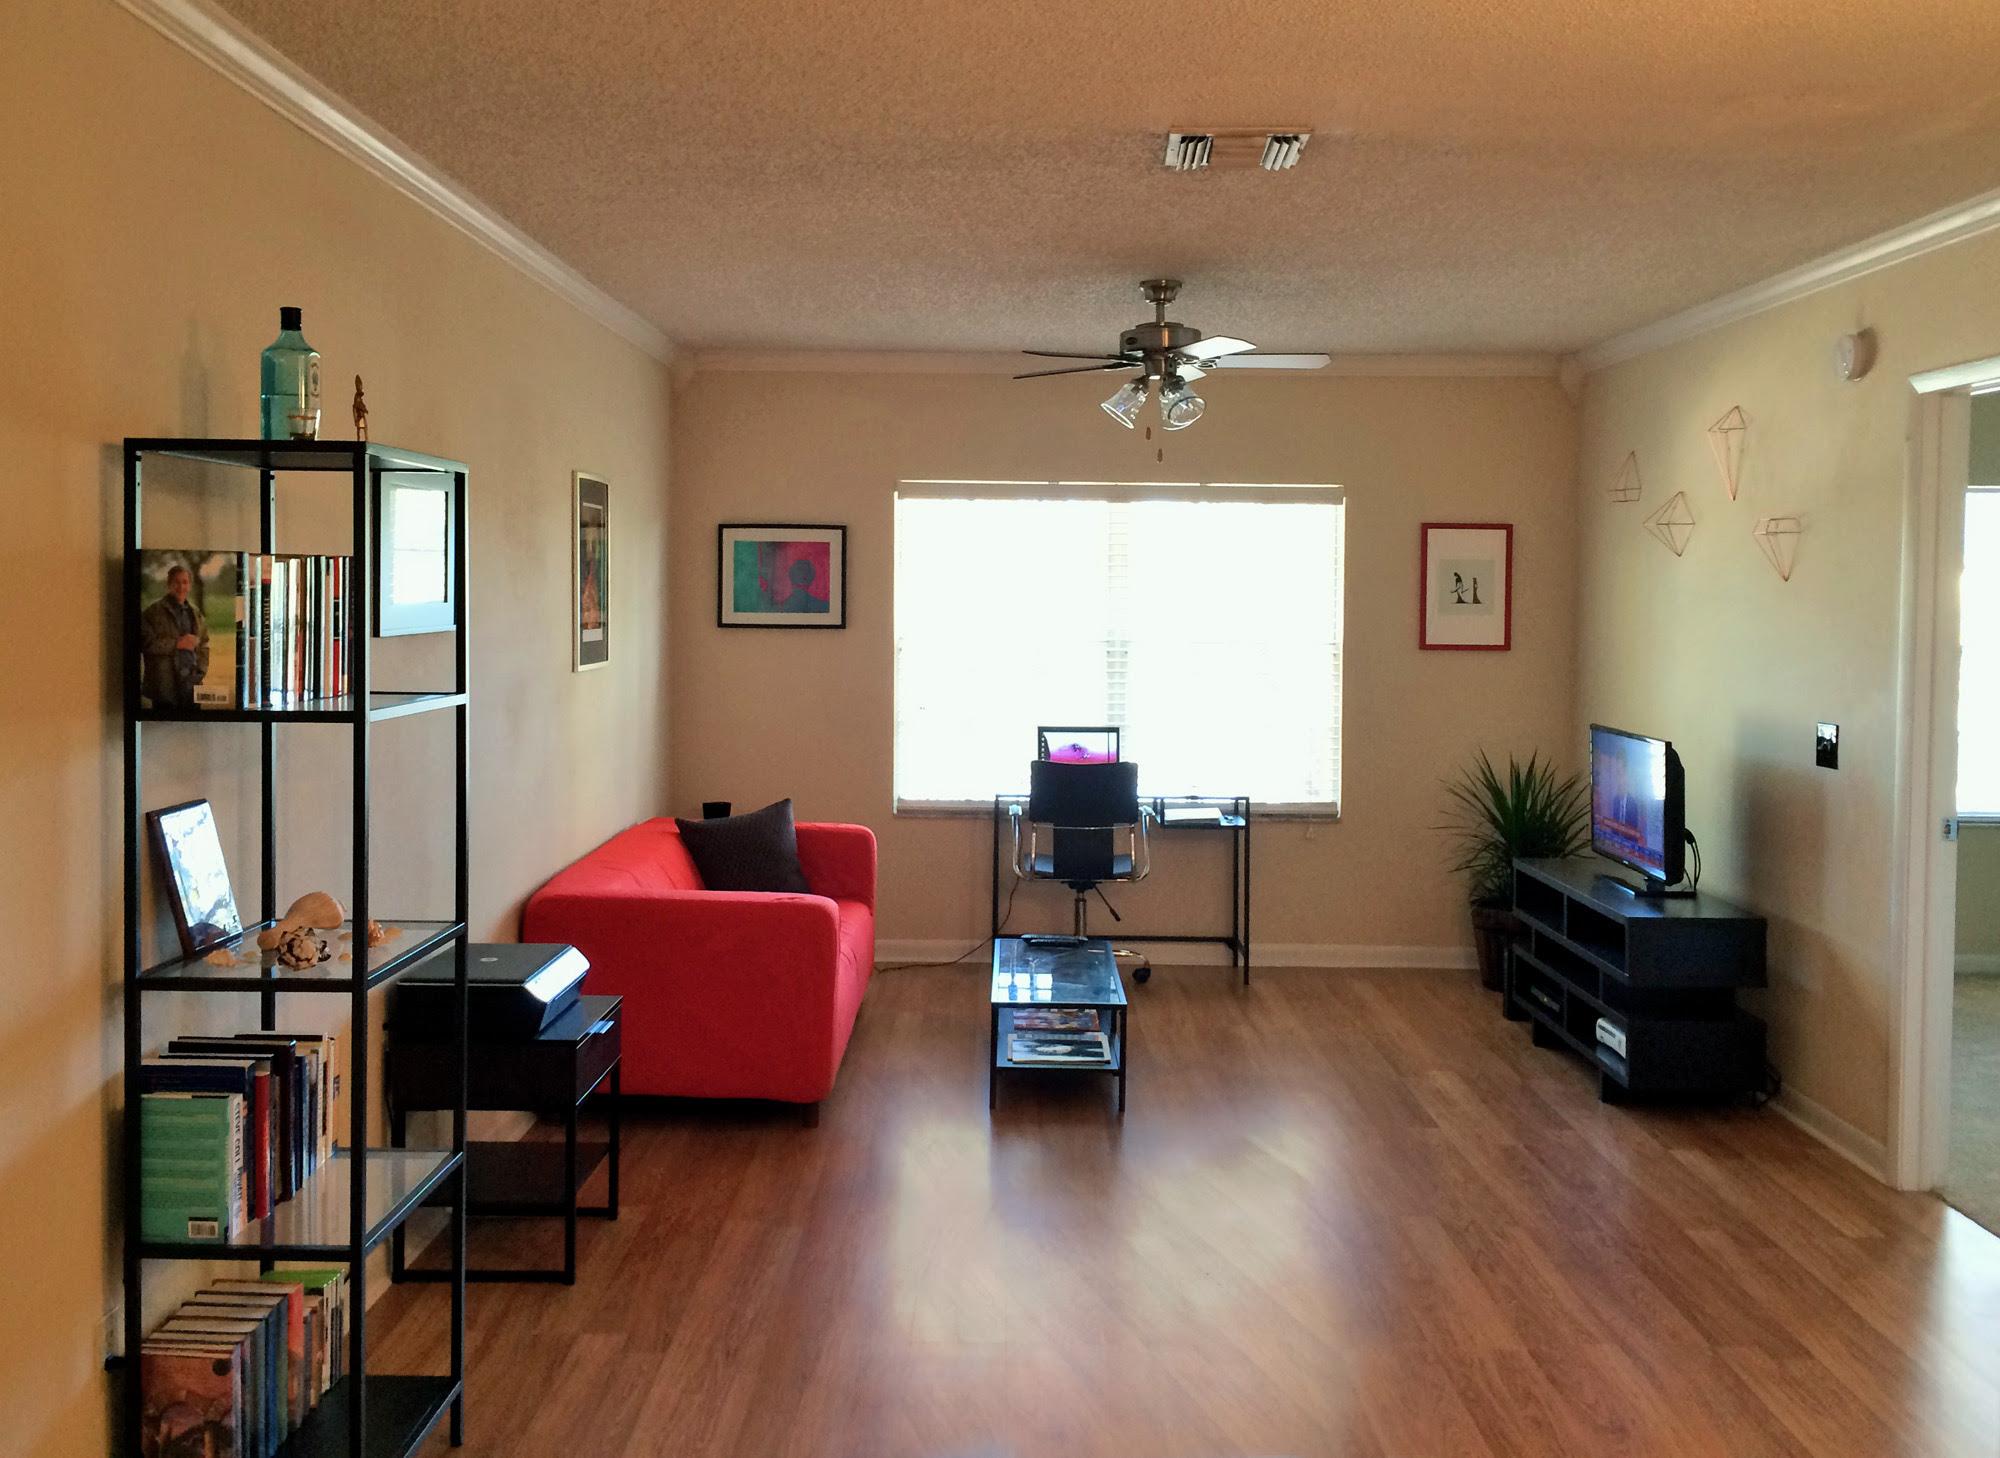 Living Room No Rug Home Designing